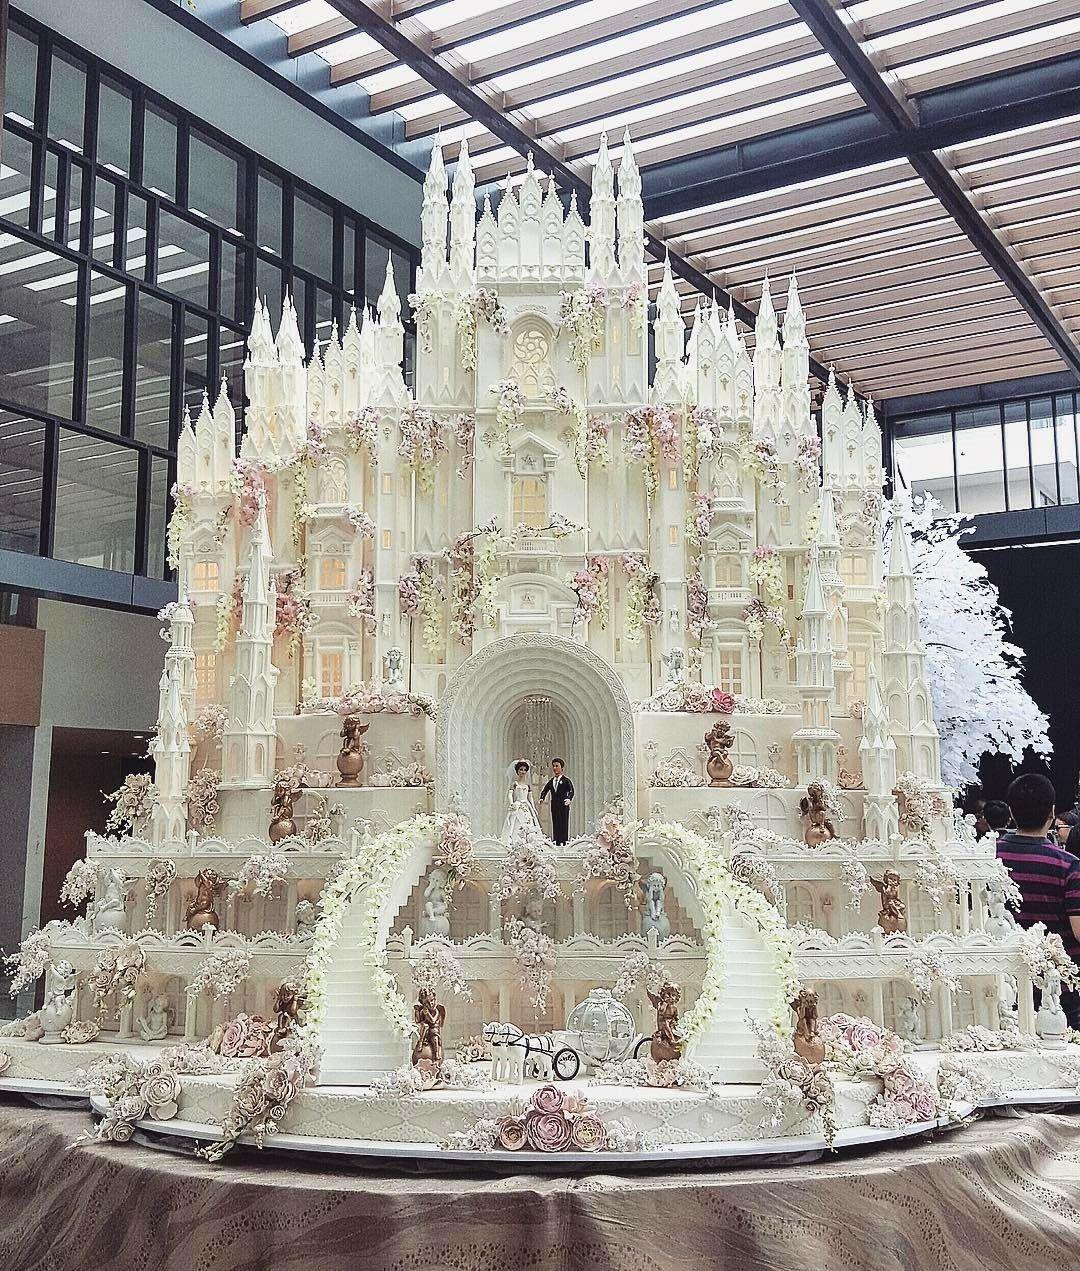 Ultra Deluxe Extravagant Dream Wedding Cake. | Future Dream